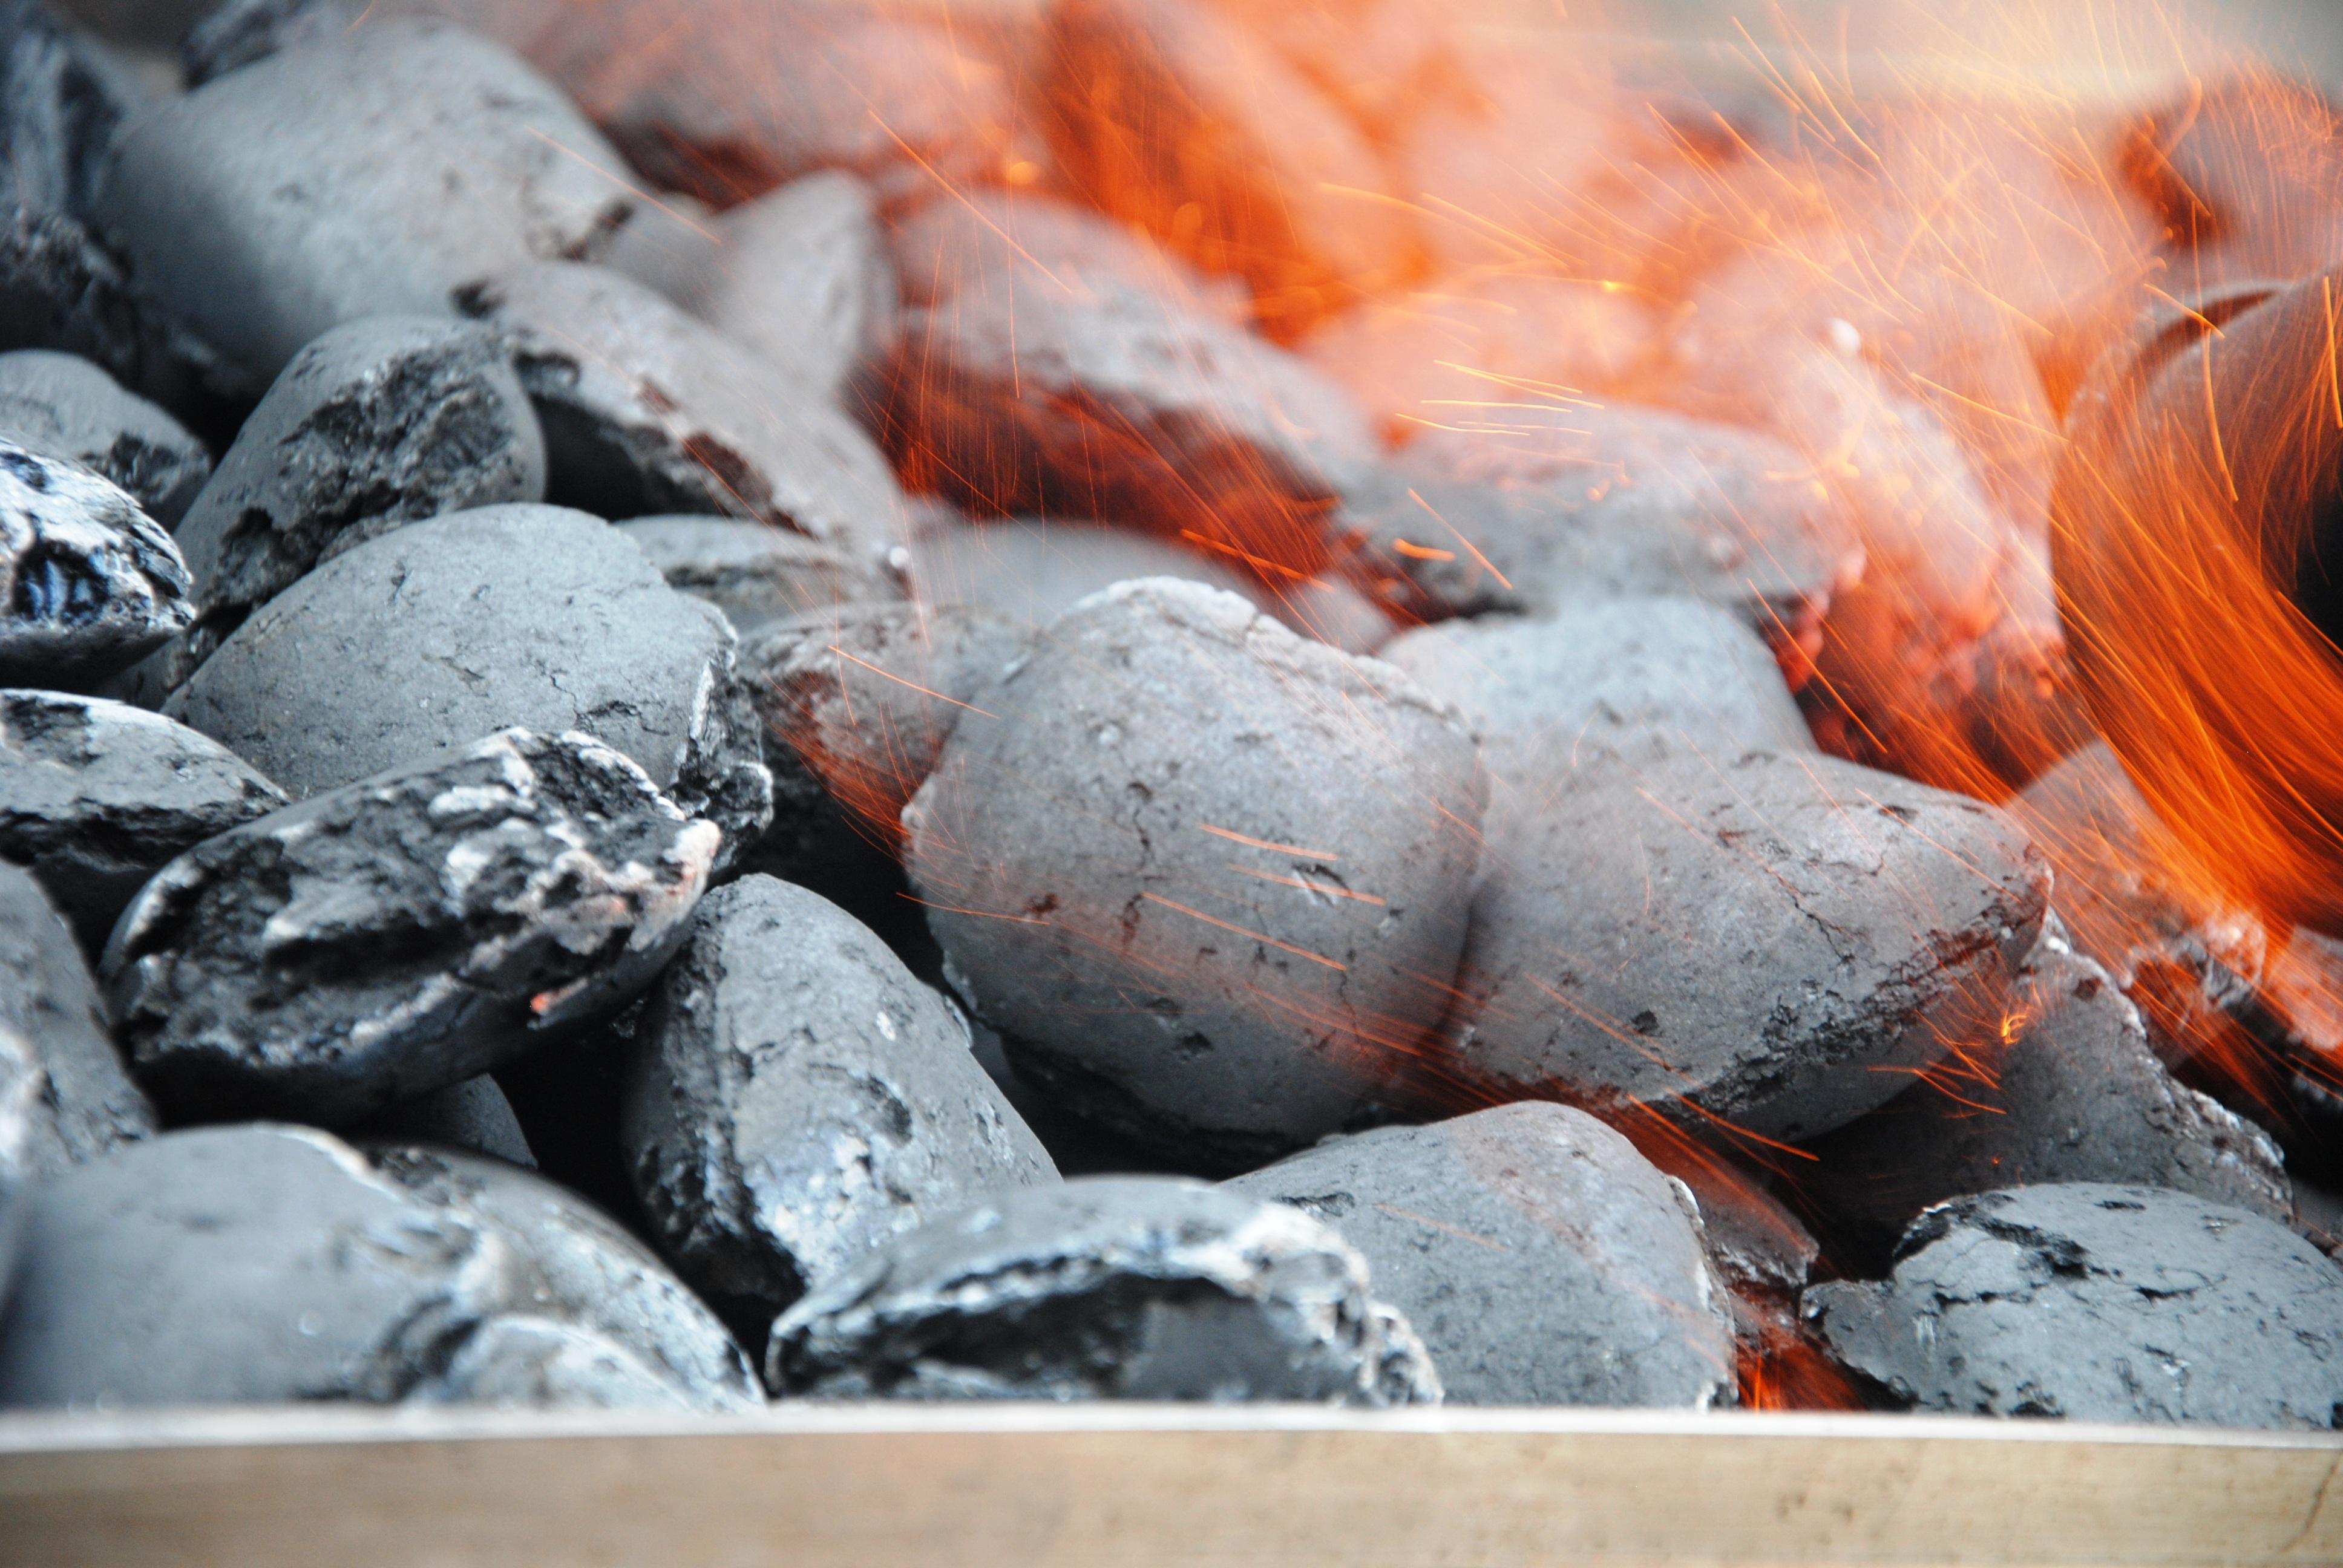 images gratuites : allumer, aliments, fruit de mer, flamme, feu